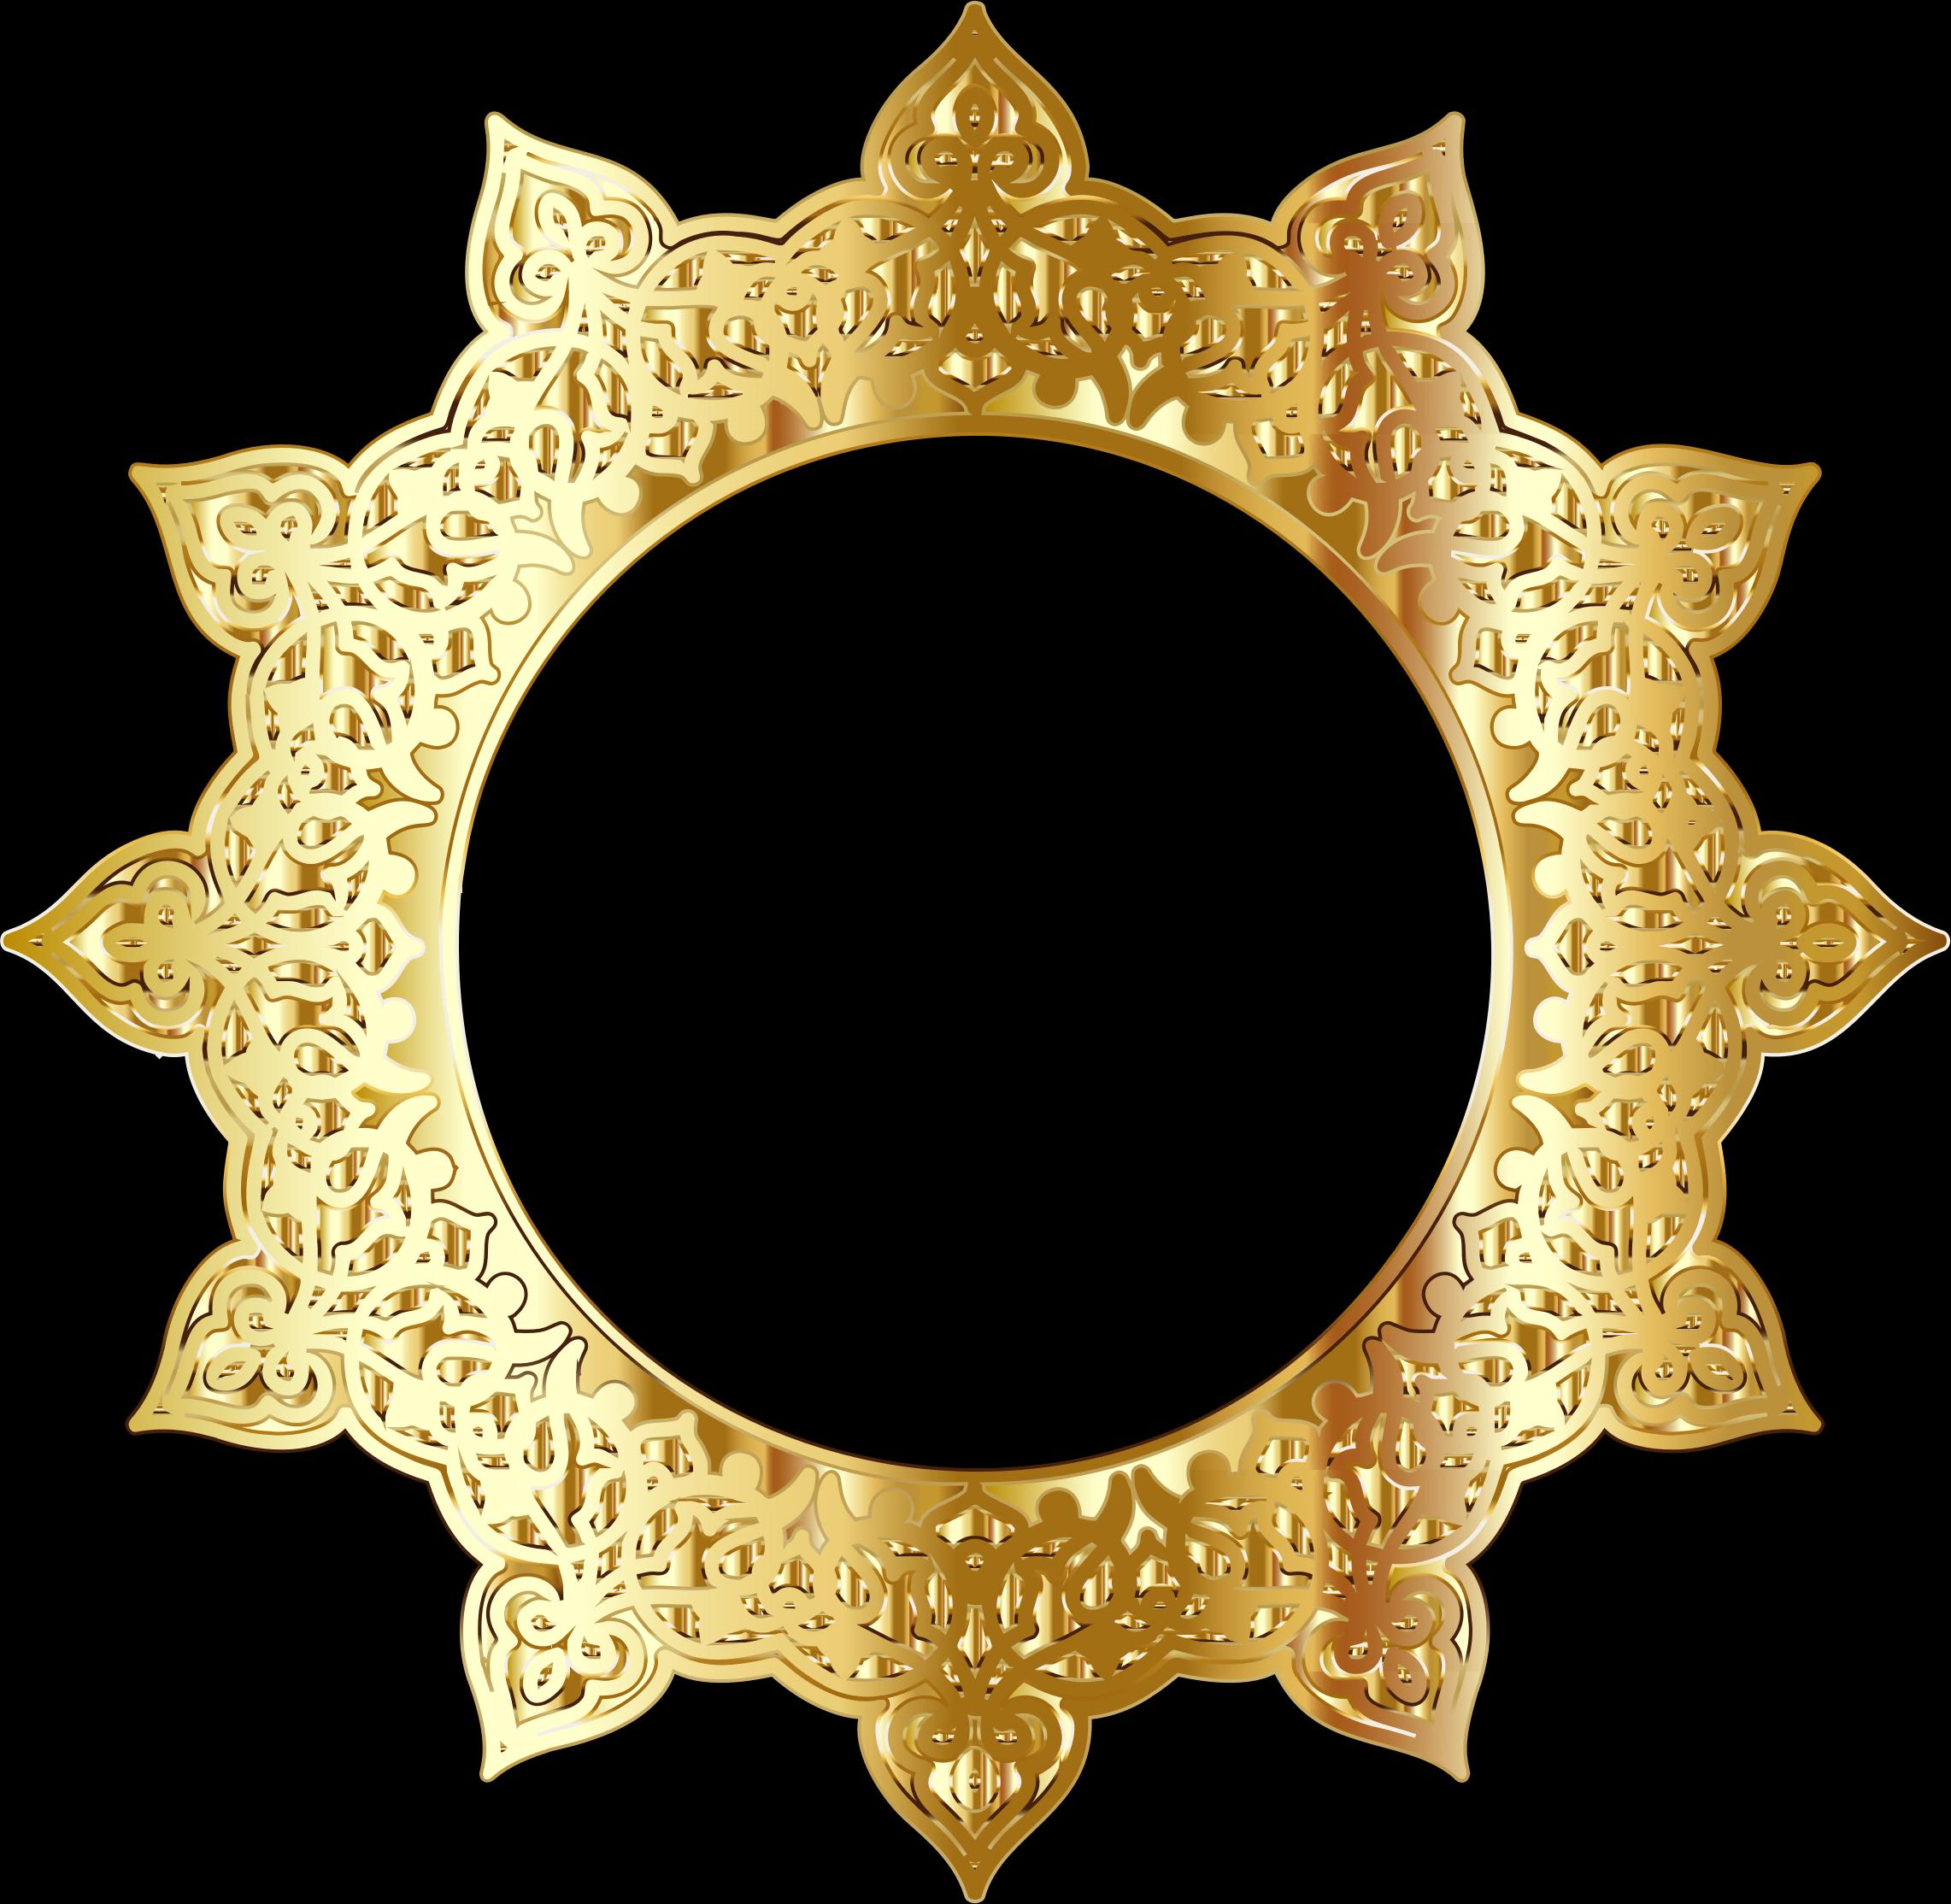 Clipart gold decorative ornamental. Golden frame png